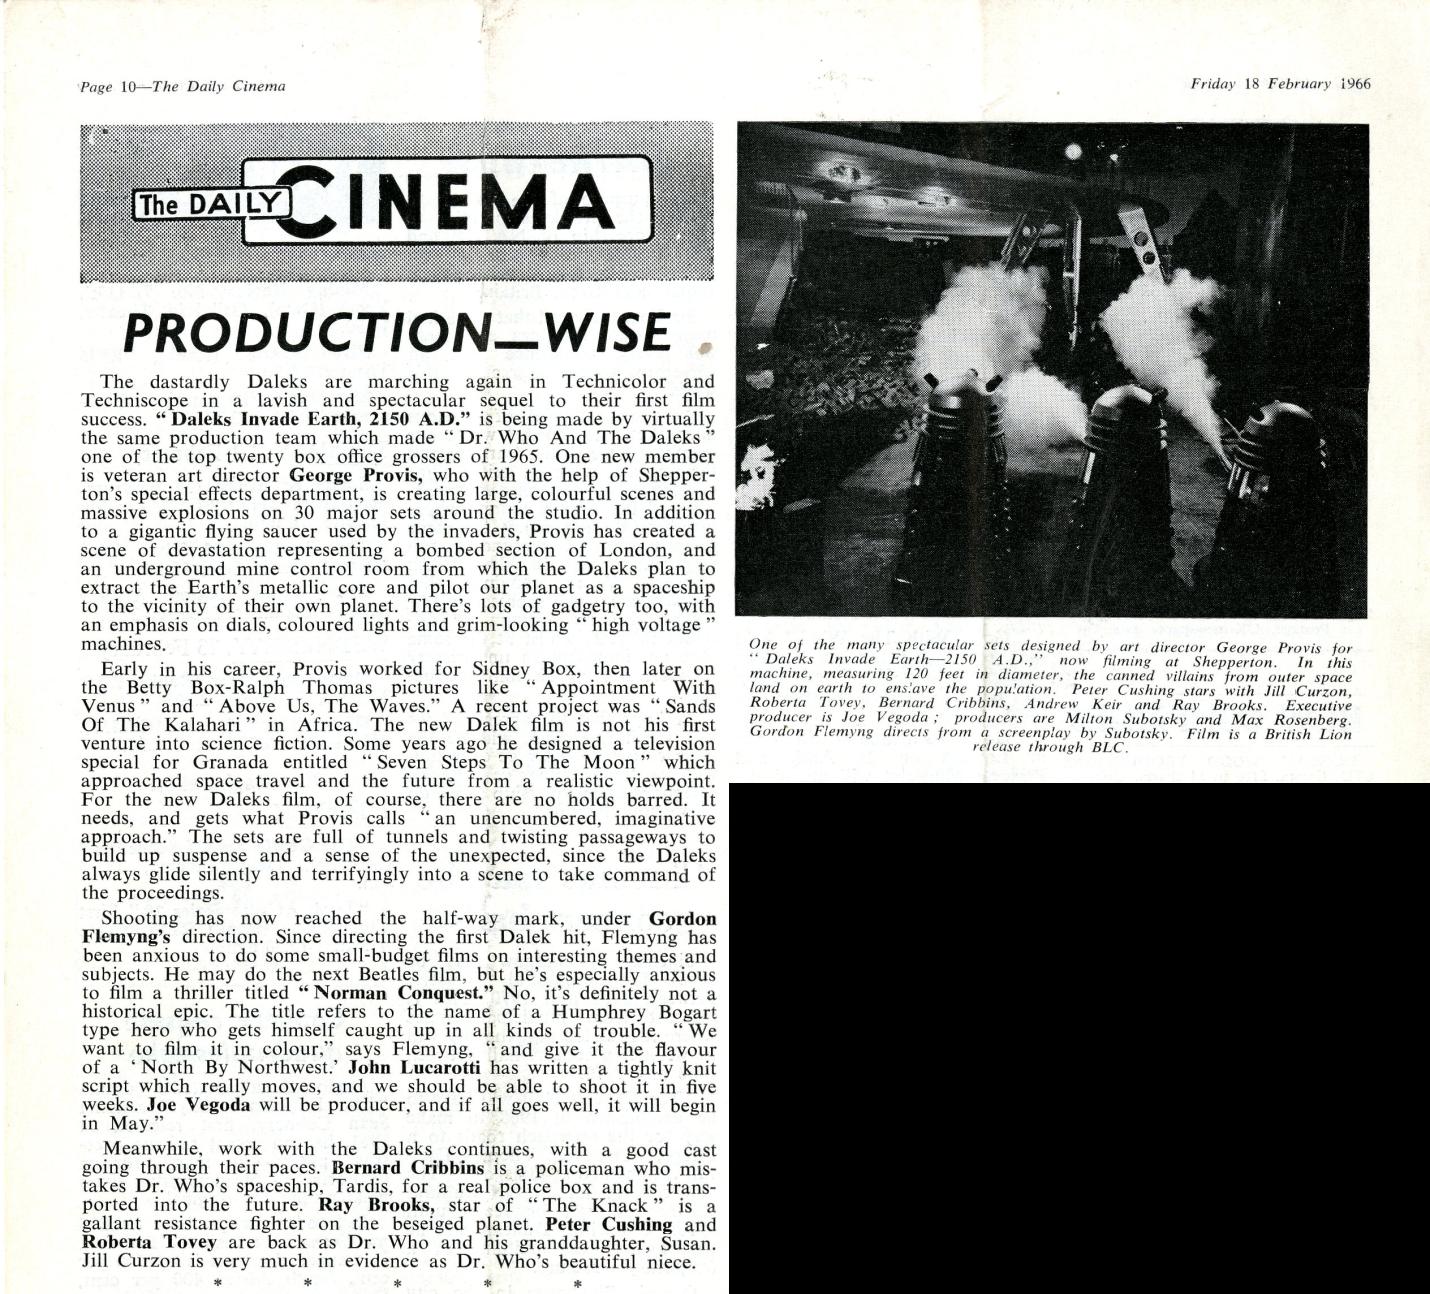 Daily Cinema, 18 February 1966